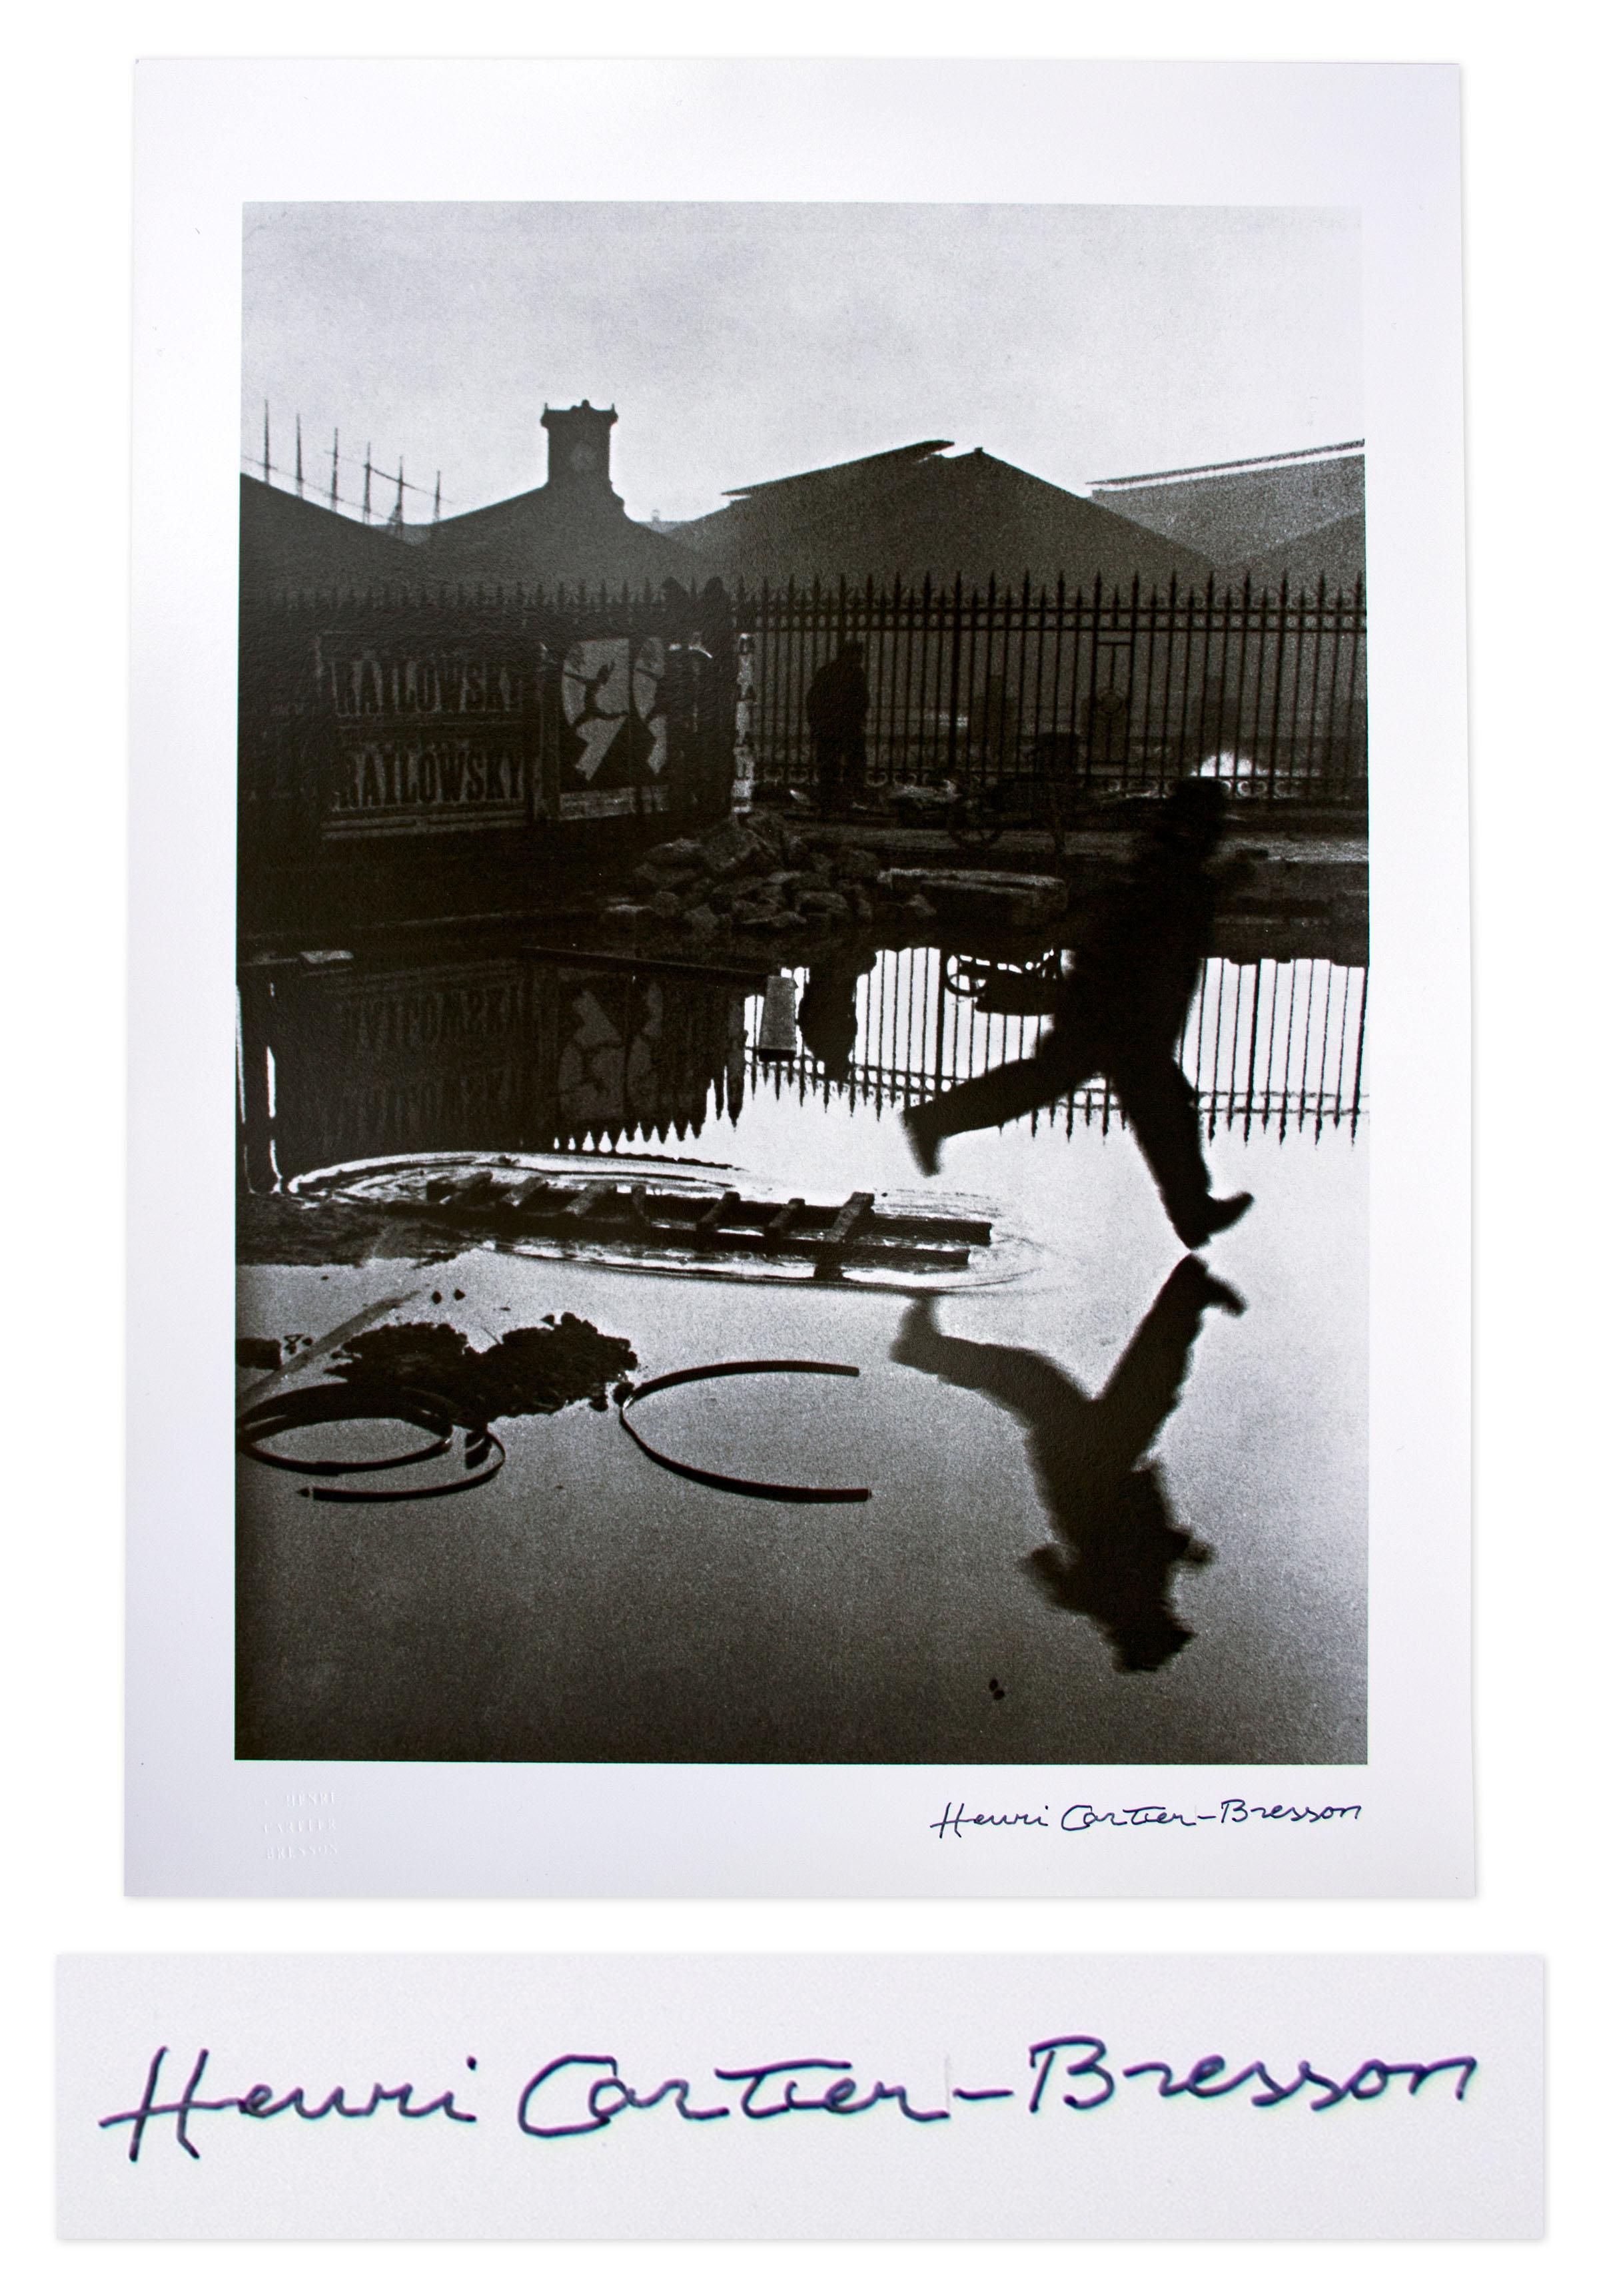 Decisive-Moment-Henri-Cartier-Bresson.jpg